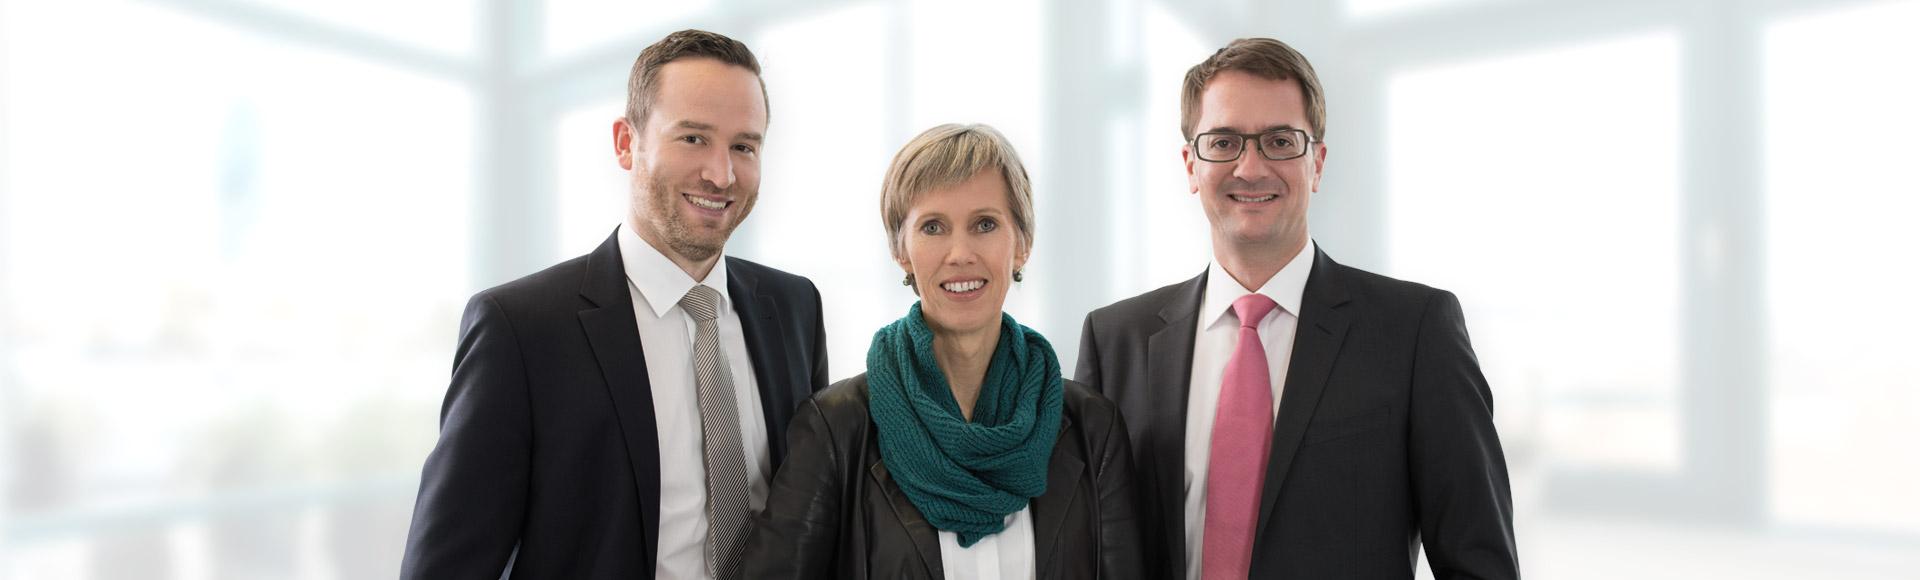 Rechtsanwalt- / Anwaltskanzlei DSSD Neustadt - Headerbild